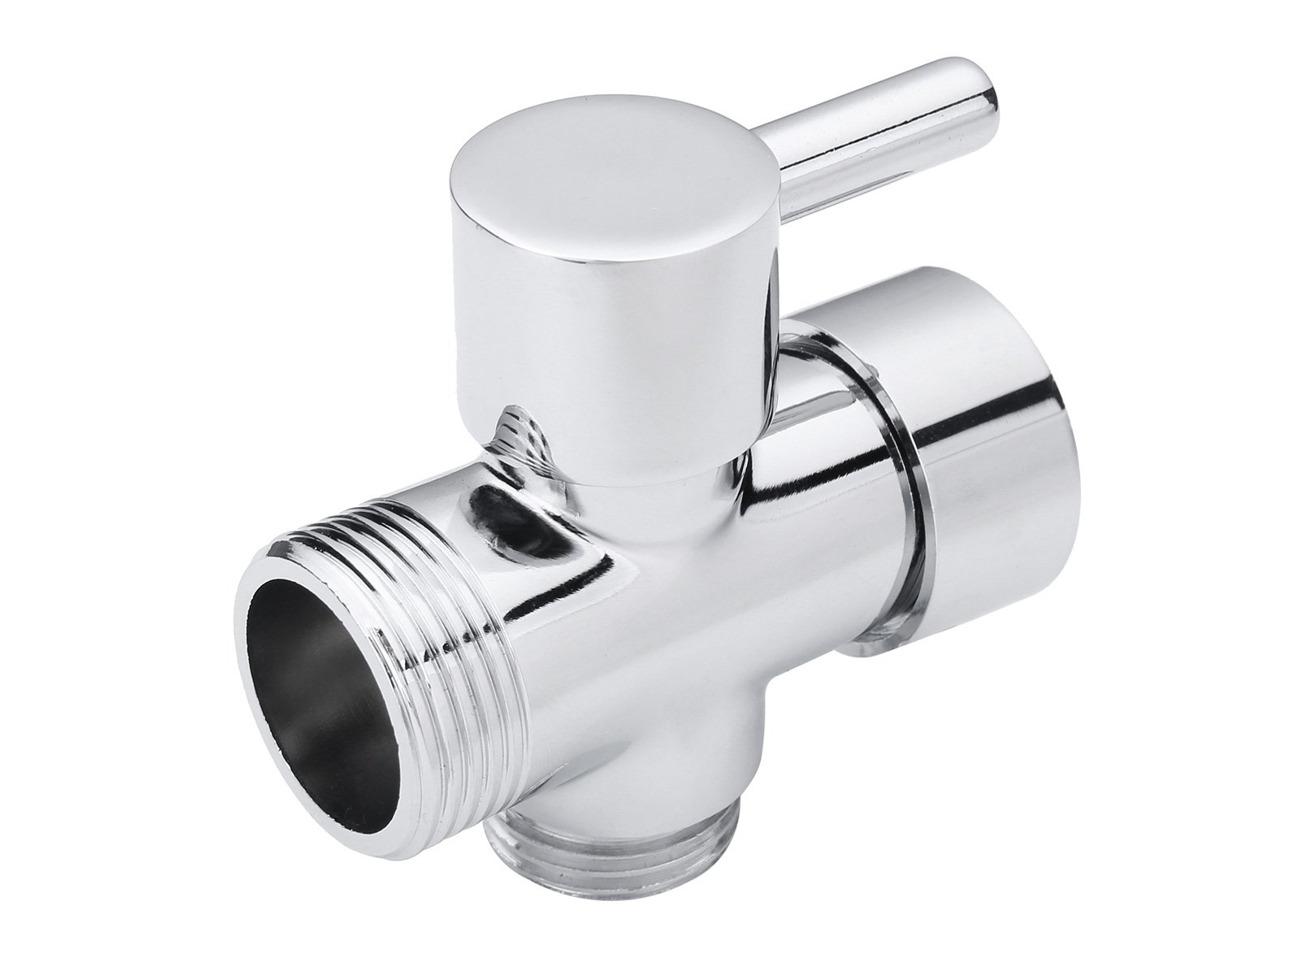 Bathroom Toilet Bidet Shattaf Shower